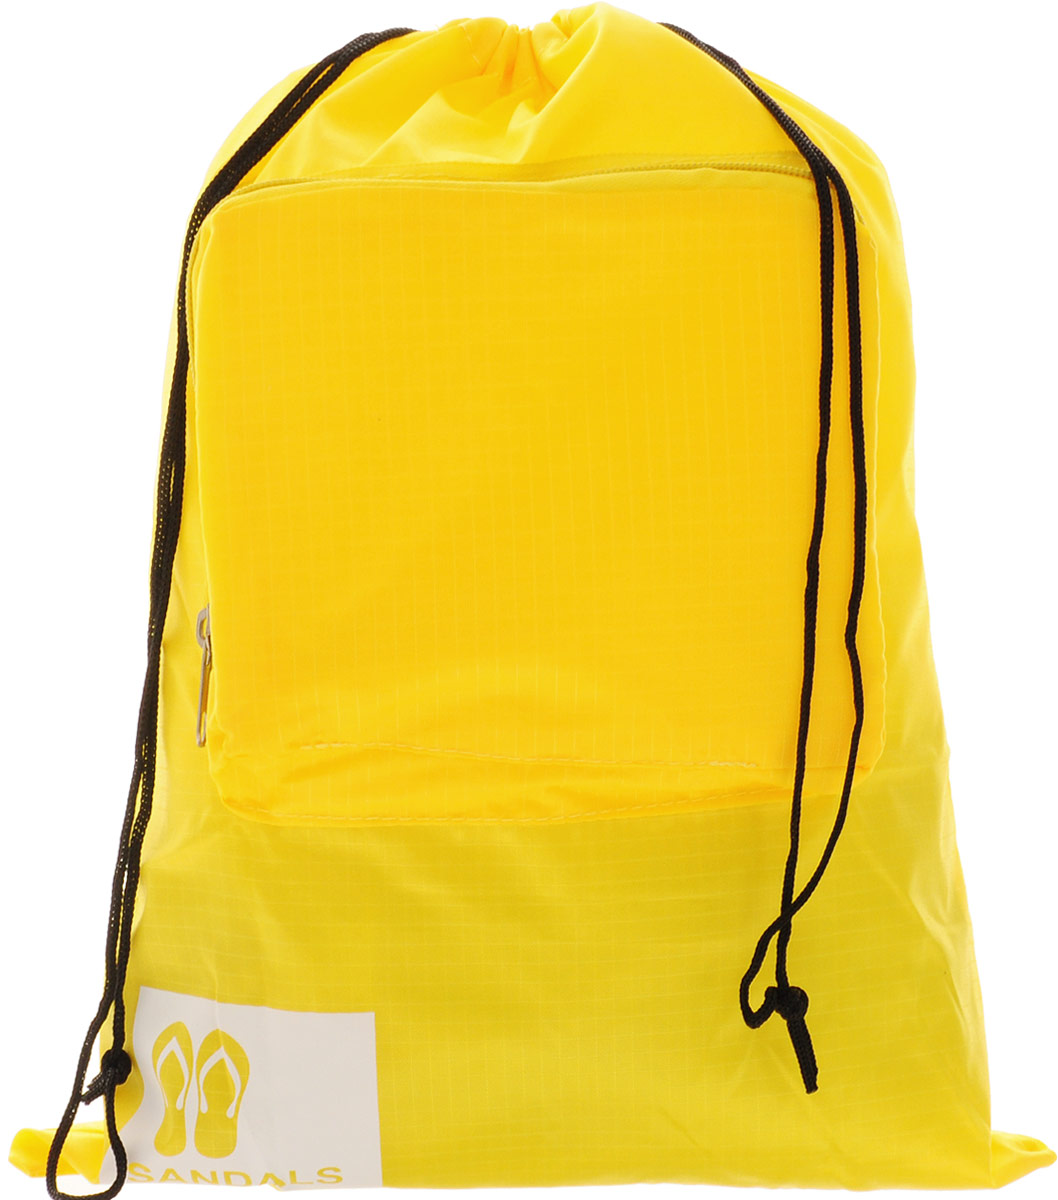 Colibri Чехол для обуви, цвет: желтый, 39 х 31 см